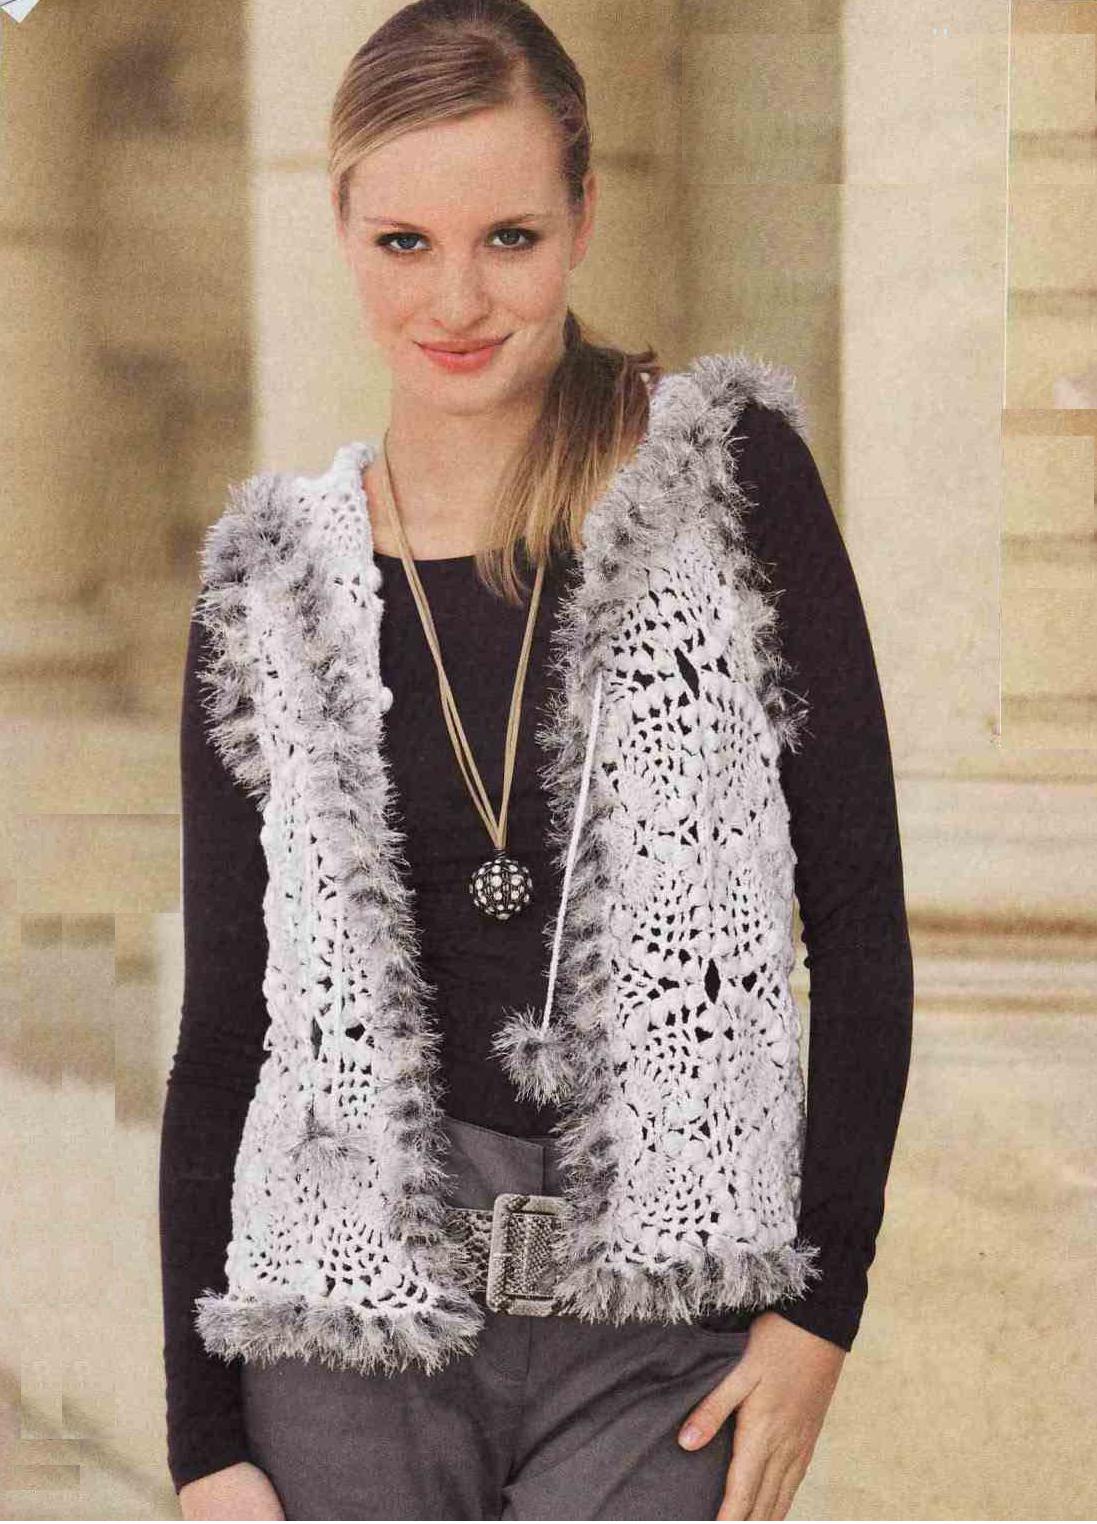 Patrones de Crochet | Chalecos | Pinterest | Patrones de crochet ...